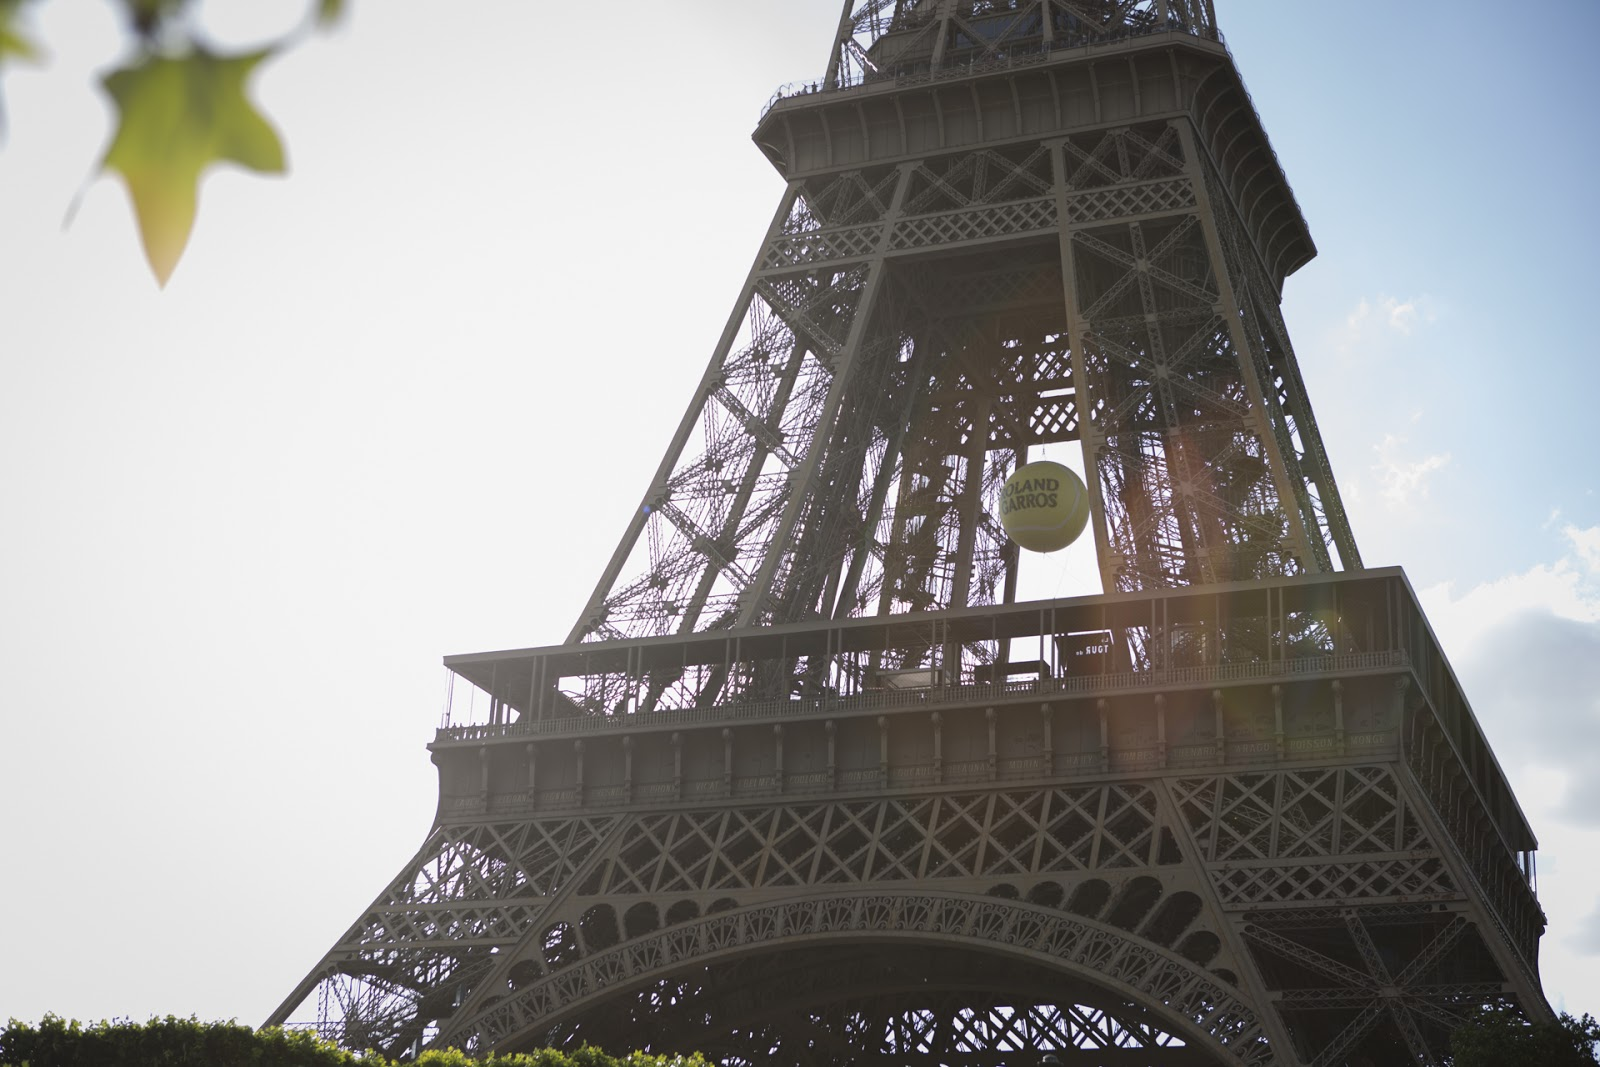 Tour Eiffel Balle de Tennis Roland Garros